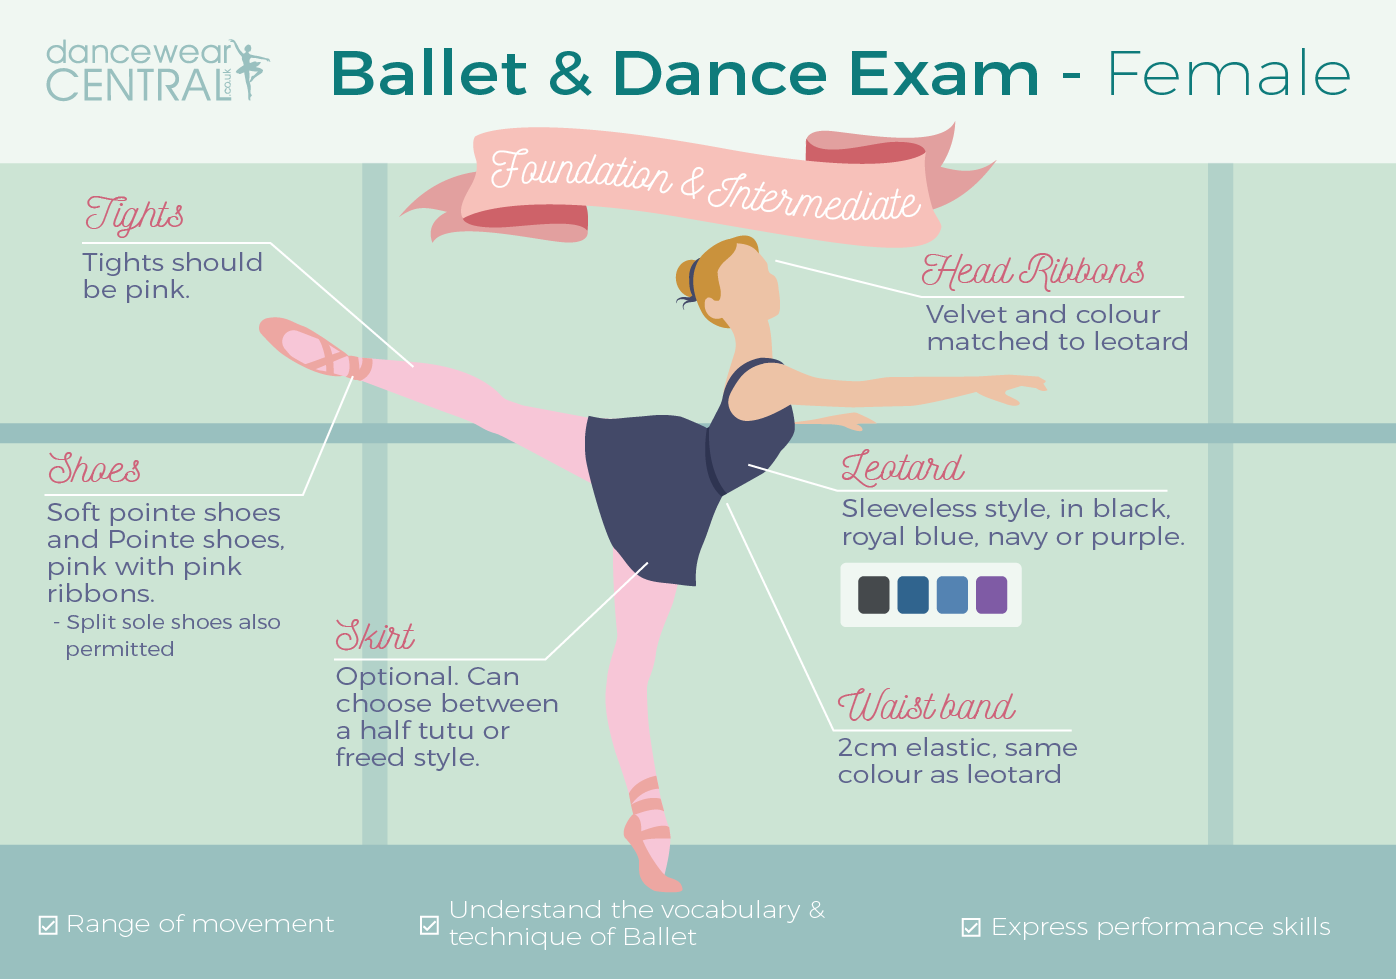 Female Ballet Dancer Uniform